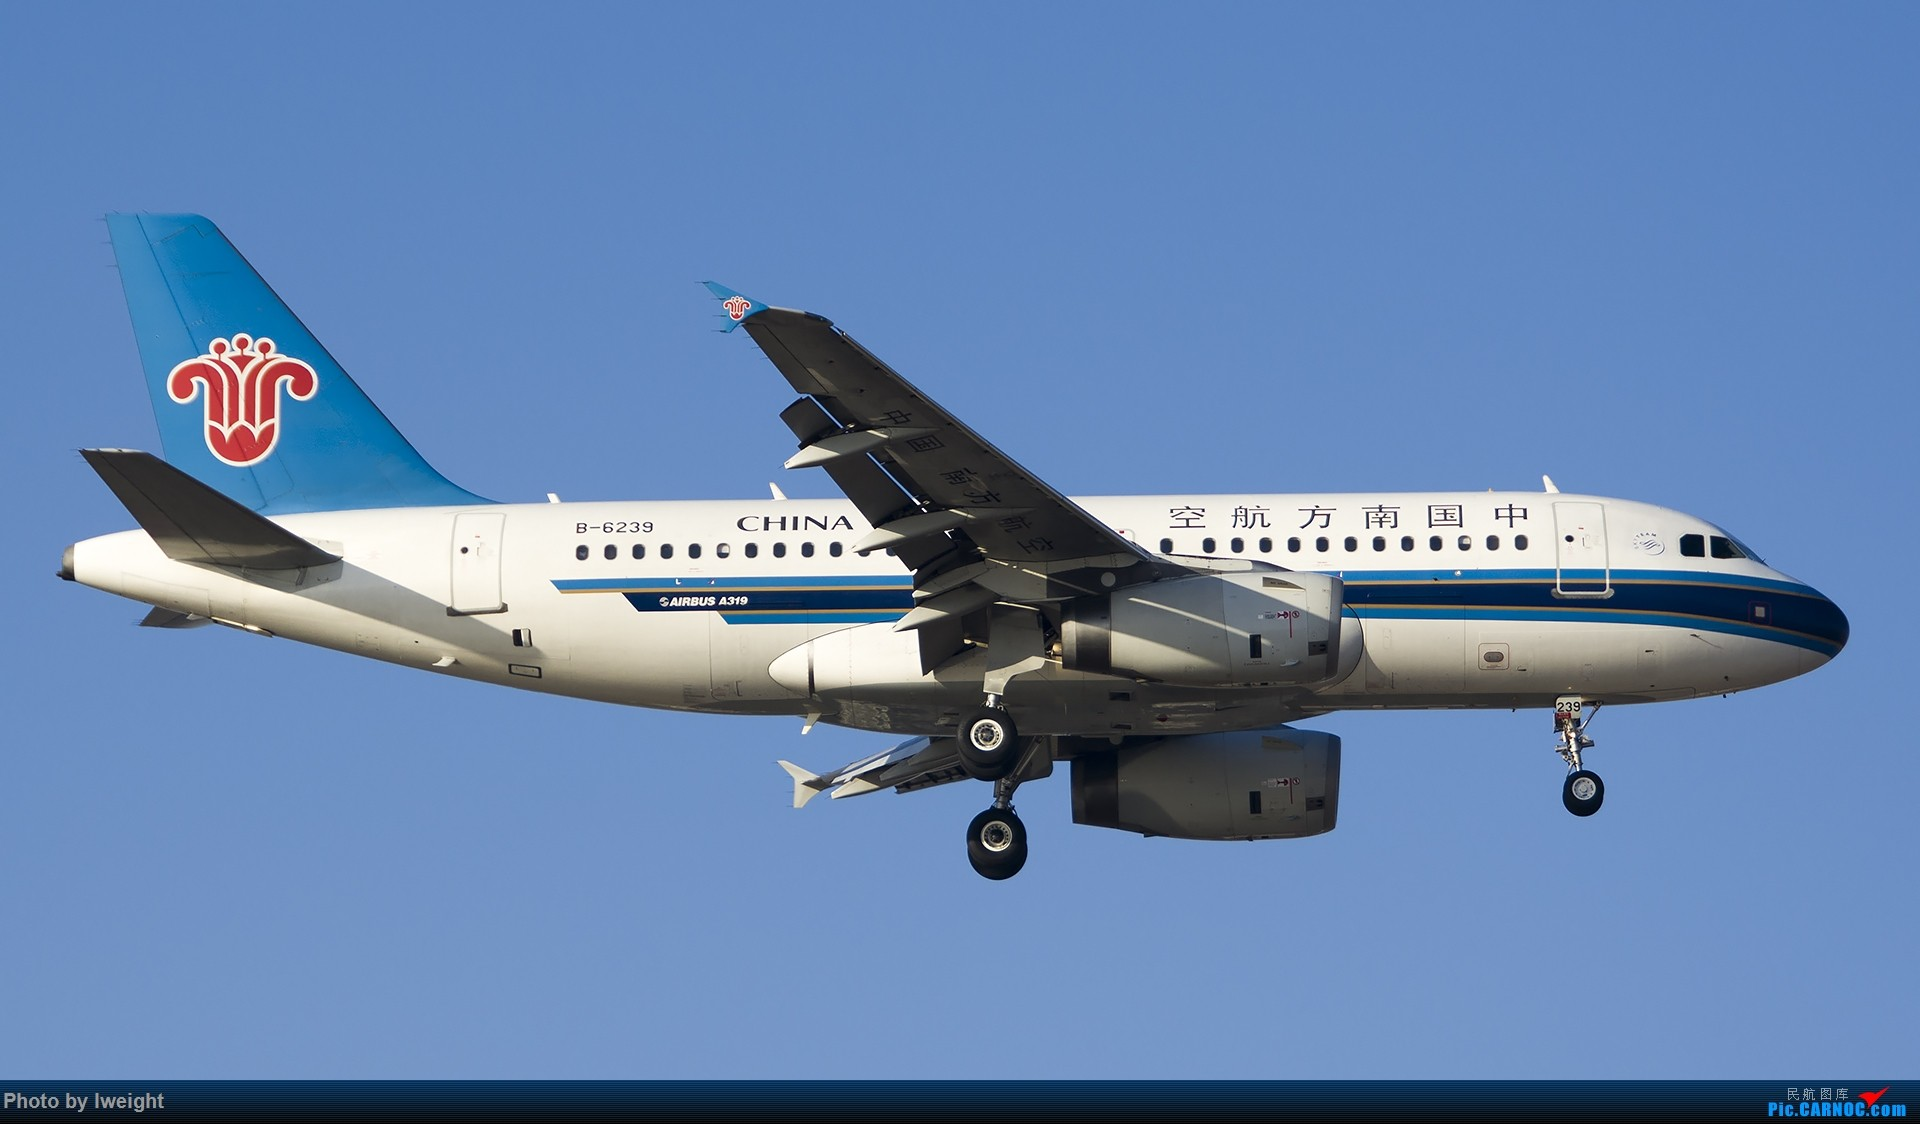 Re:[原创]庆祝升级777,发上今天在首都机场拍的所有飞机【2014-12-14】 AIRBUS A319-100 B-6239 中国北京首都国际机场